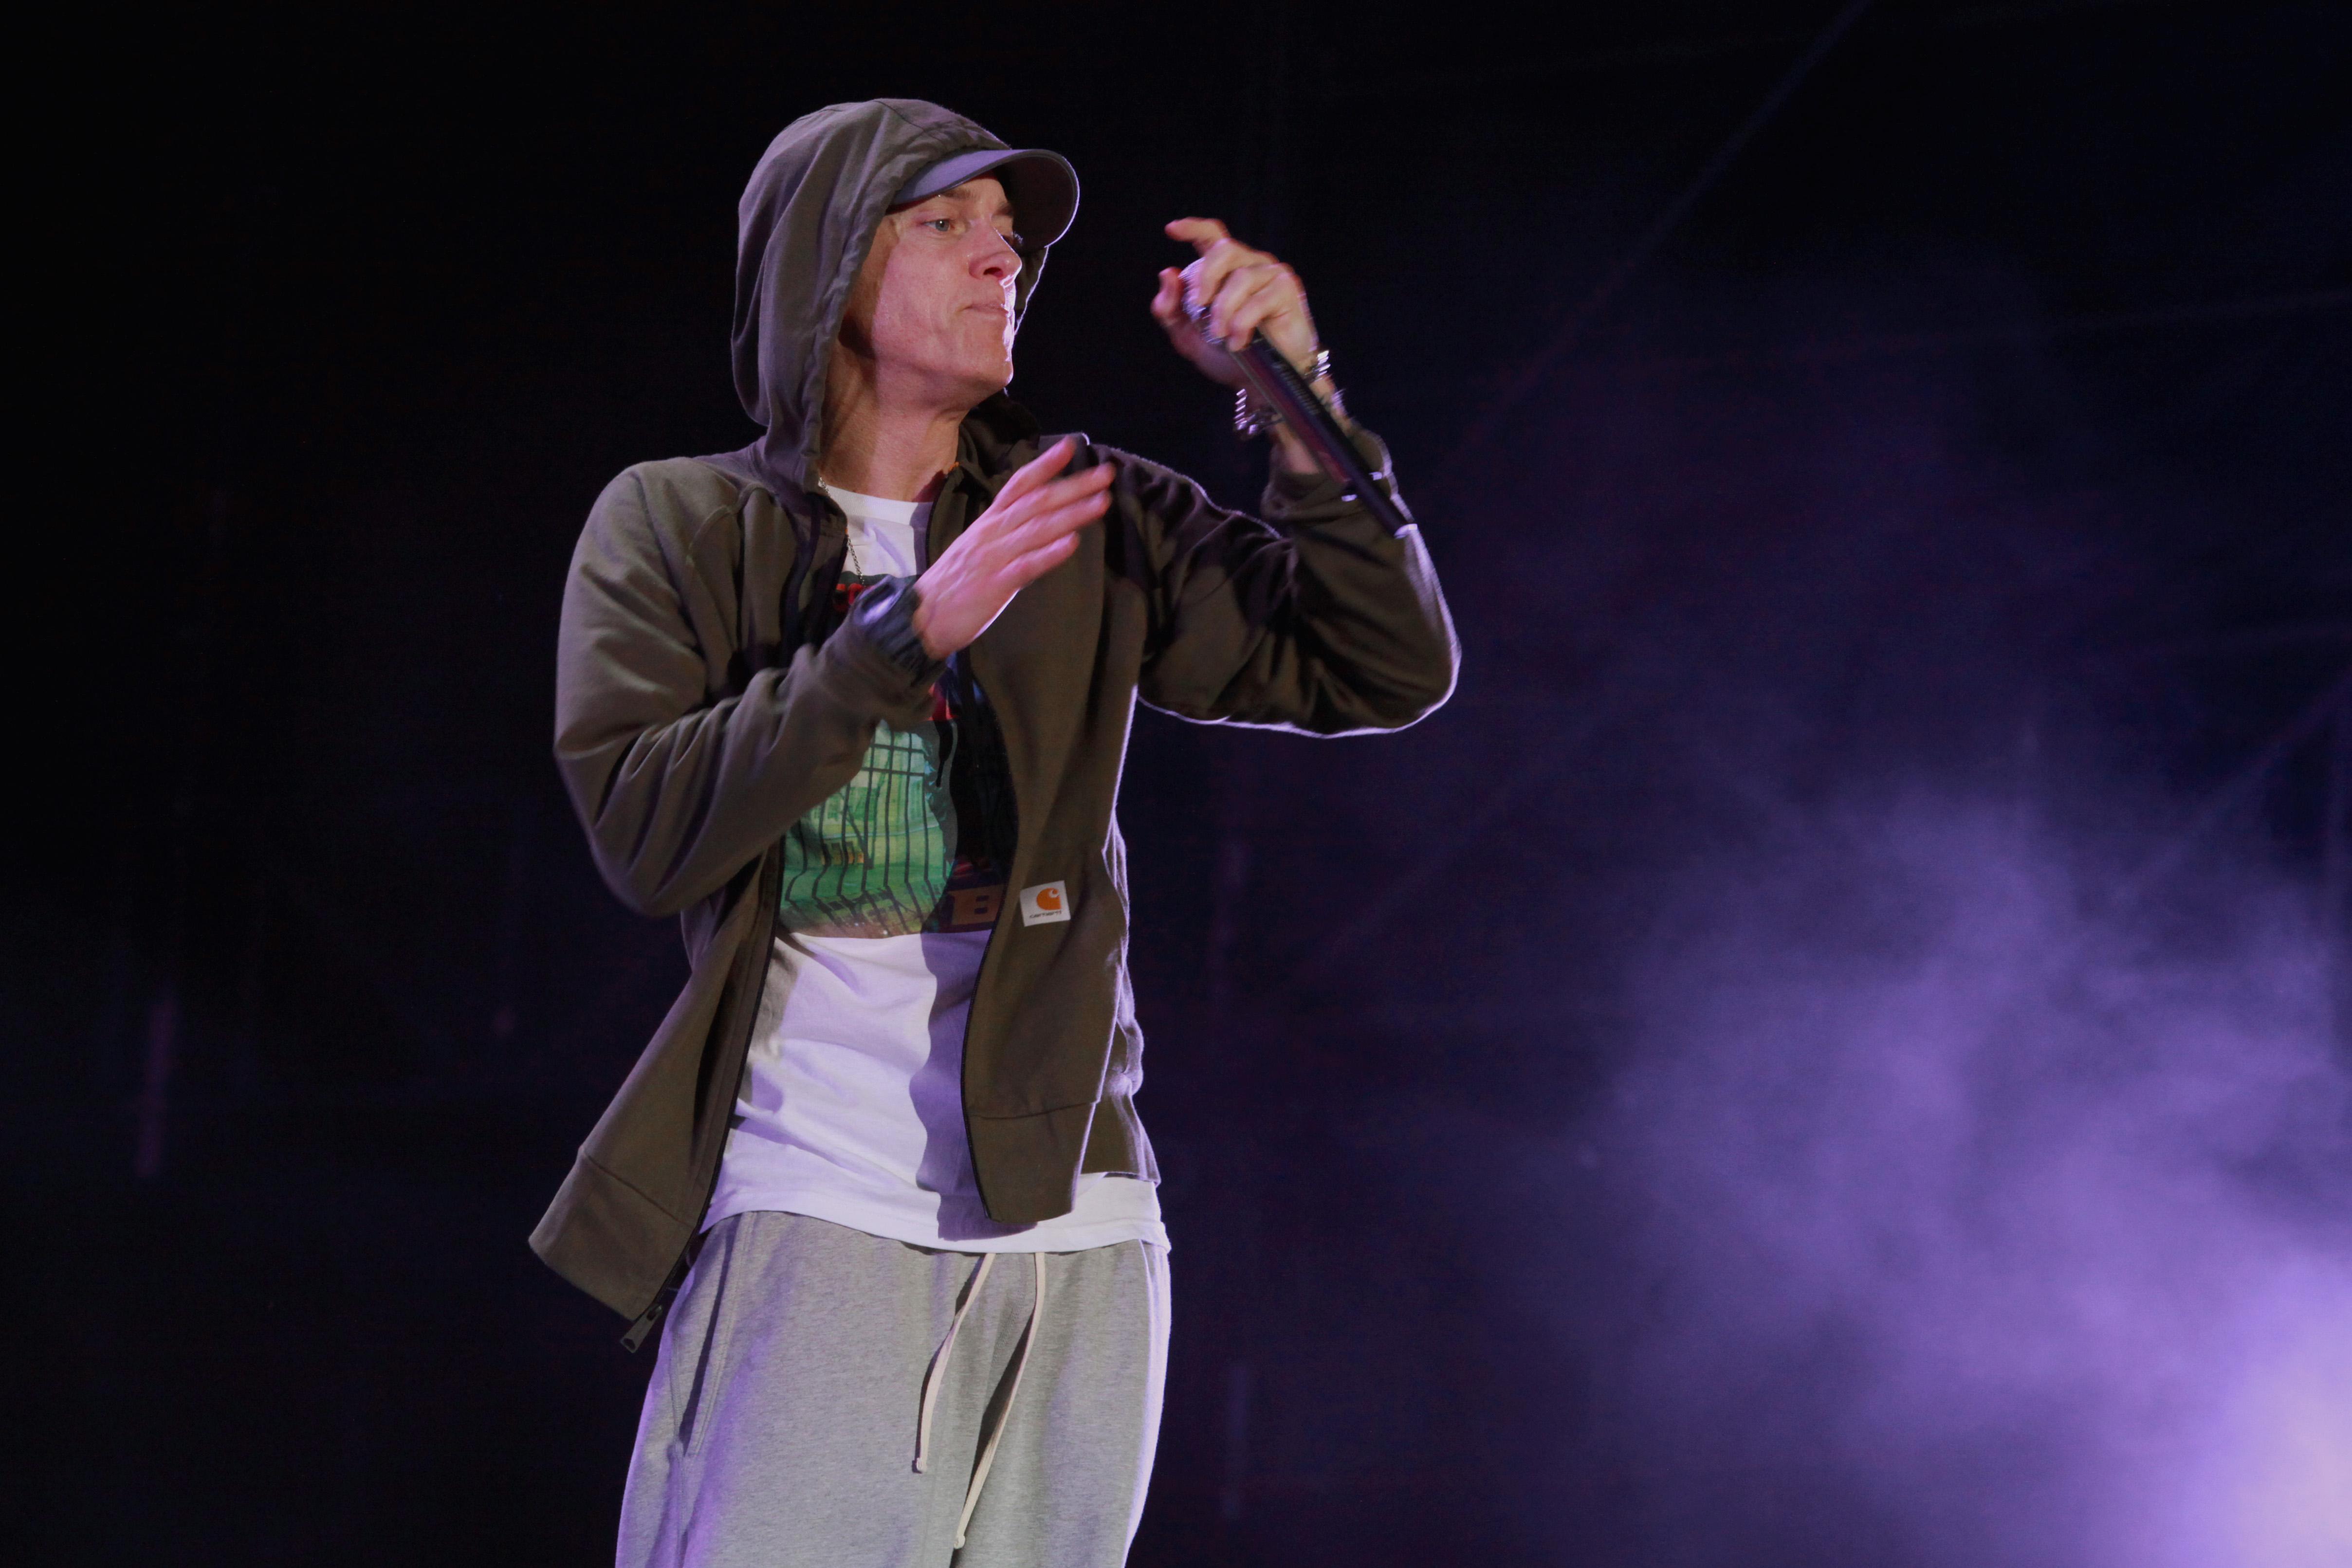 d0daa9fe555 Hear Eminem and Sia s Triumphant New Duet  Guts Over Fear  – Rolling ...